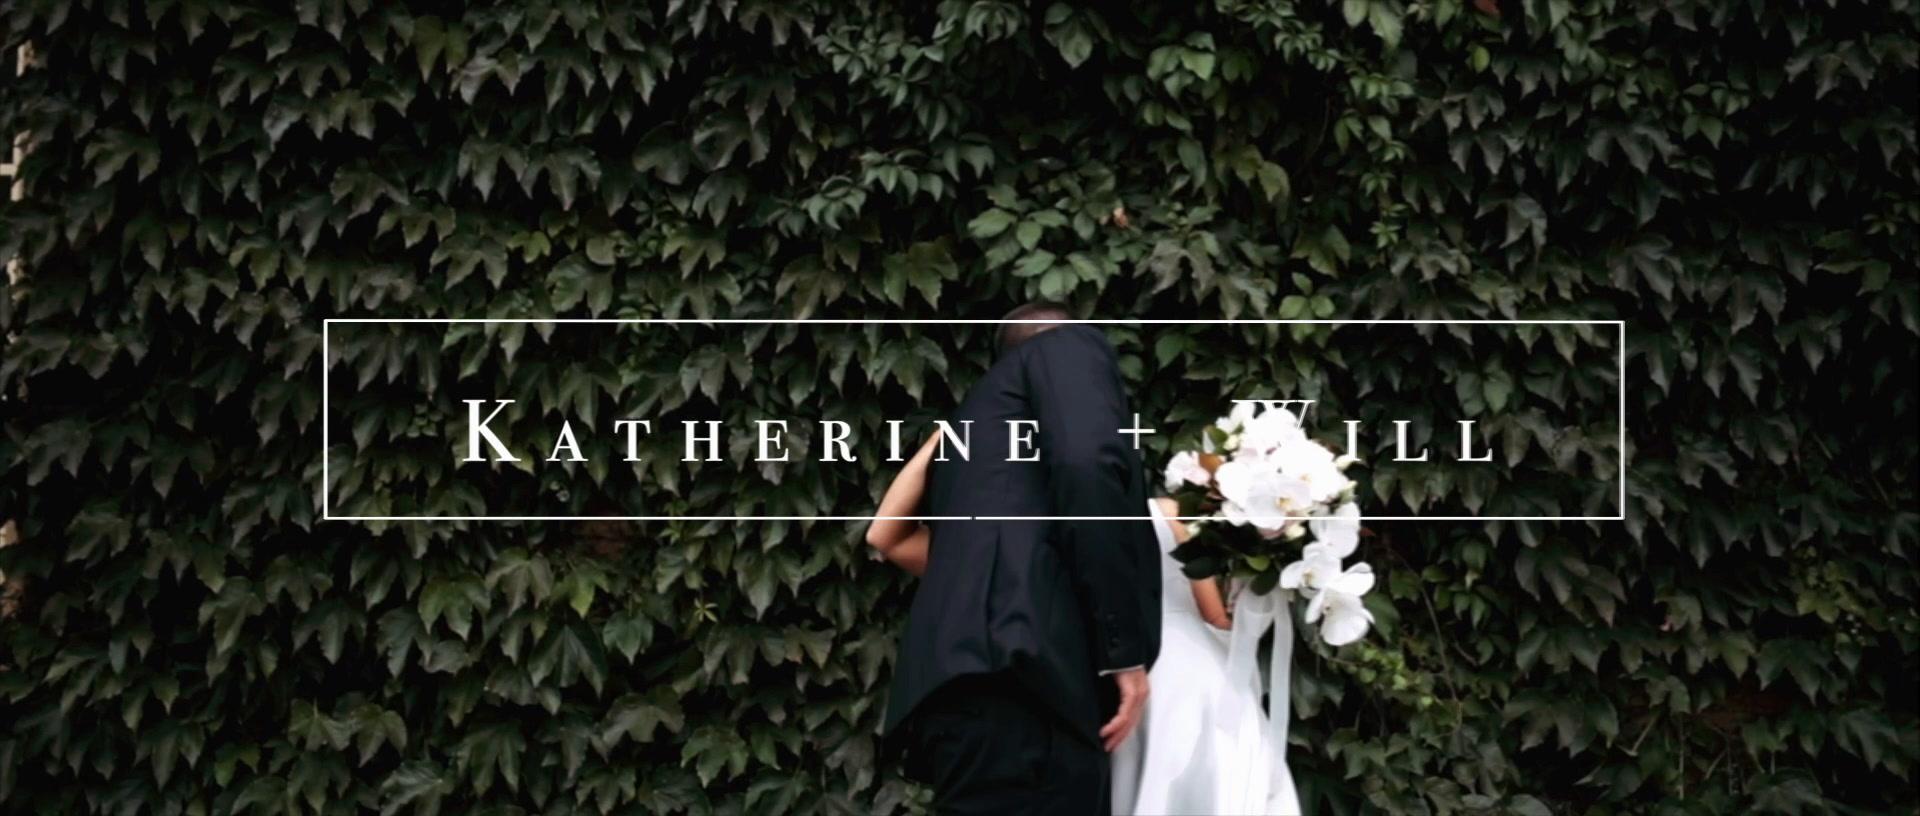 Katherine + Will | Adelaide, Australia | Home